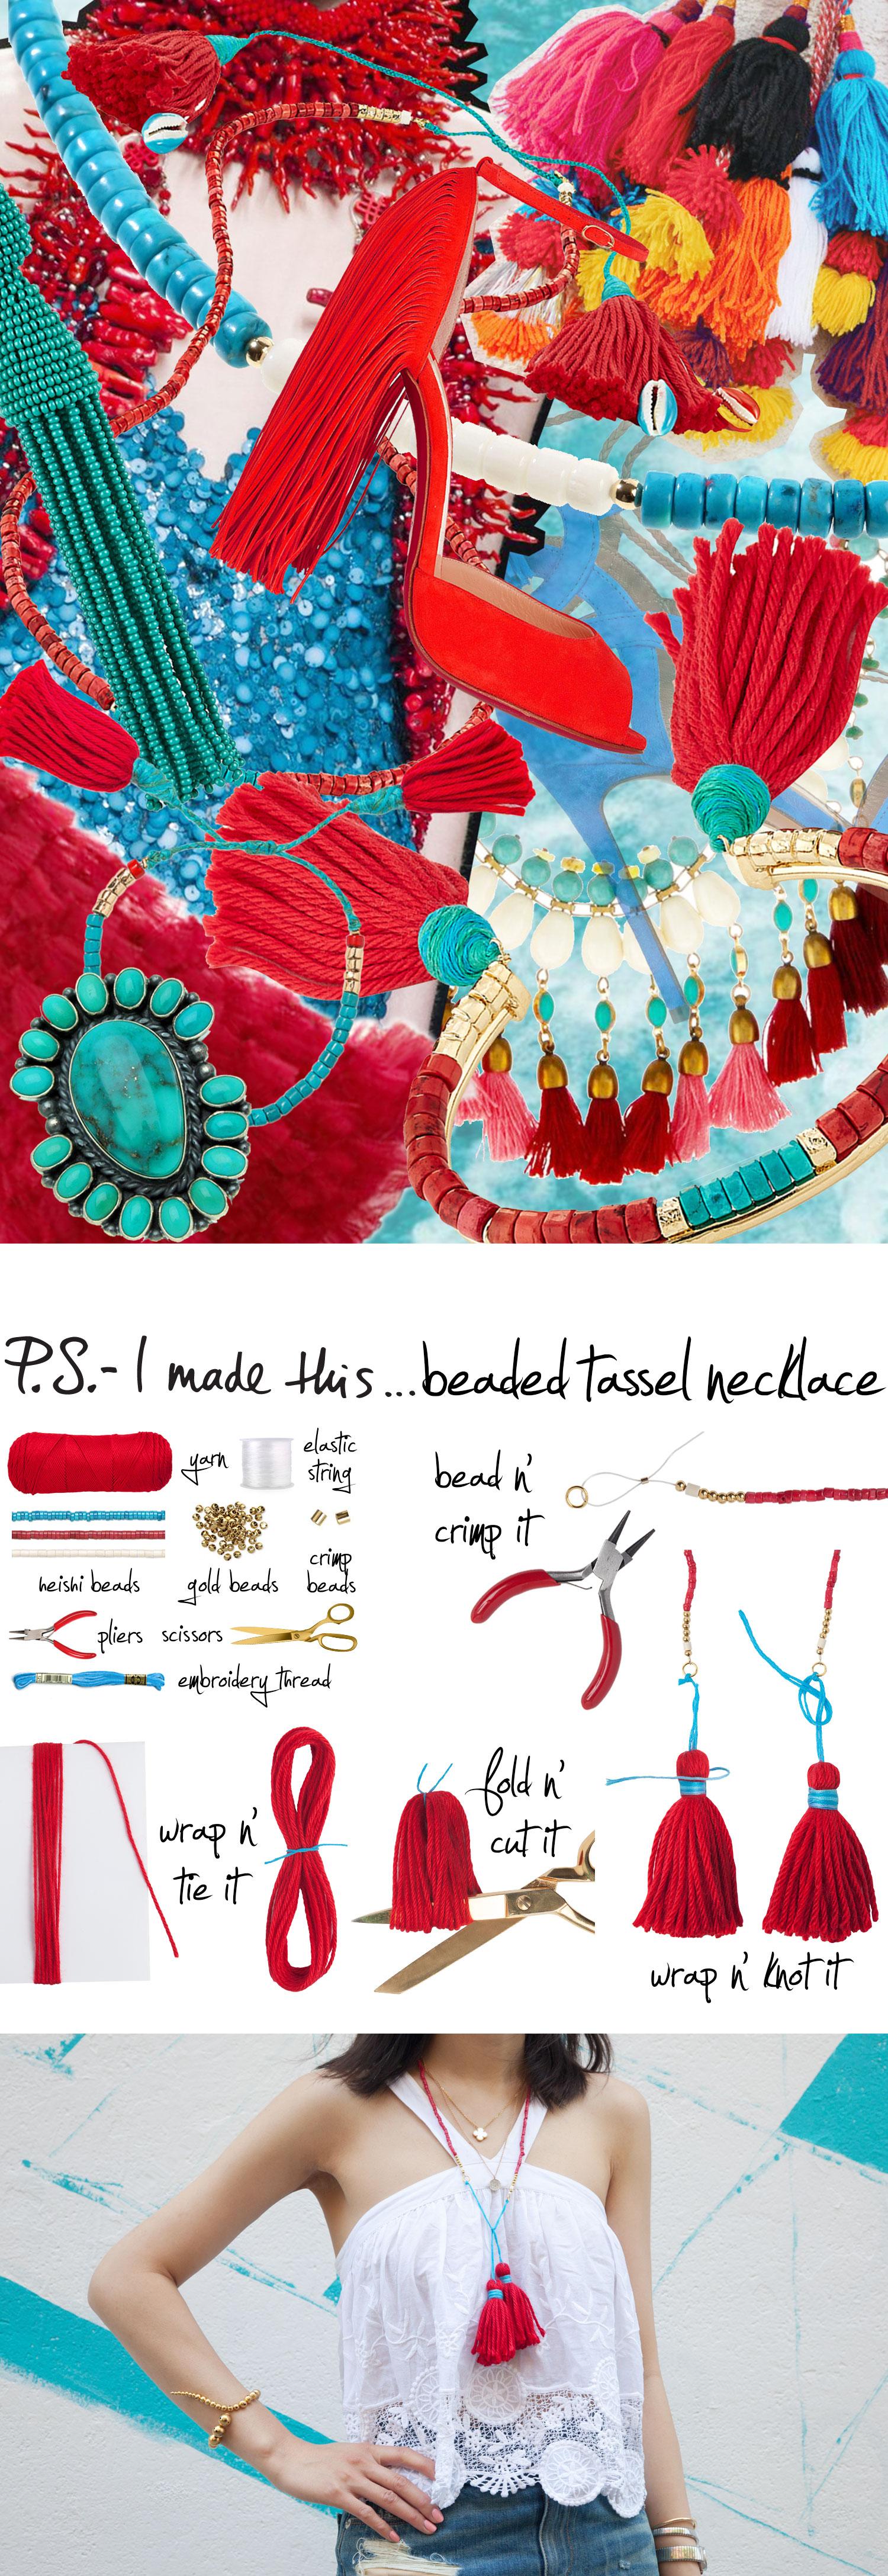 06.18.15_Beaded-Tassel-Necklace-MErGED